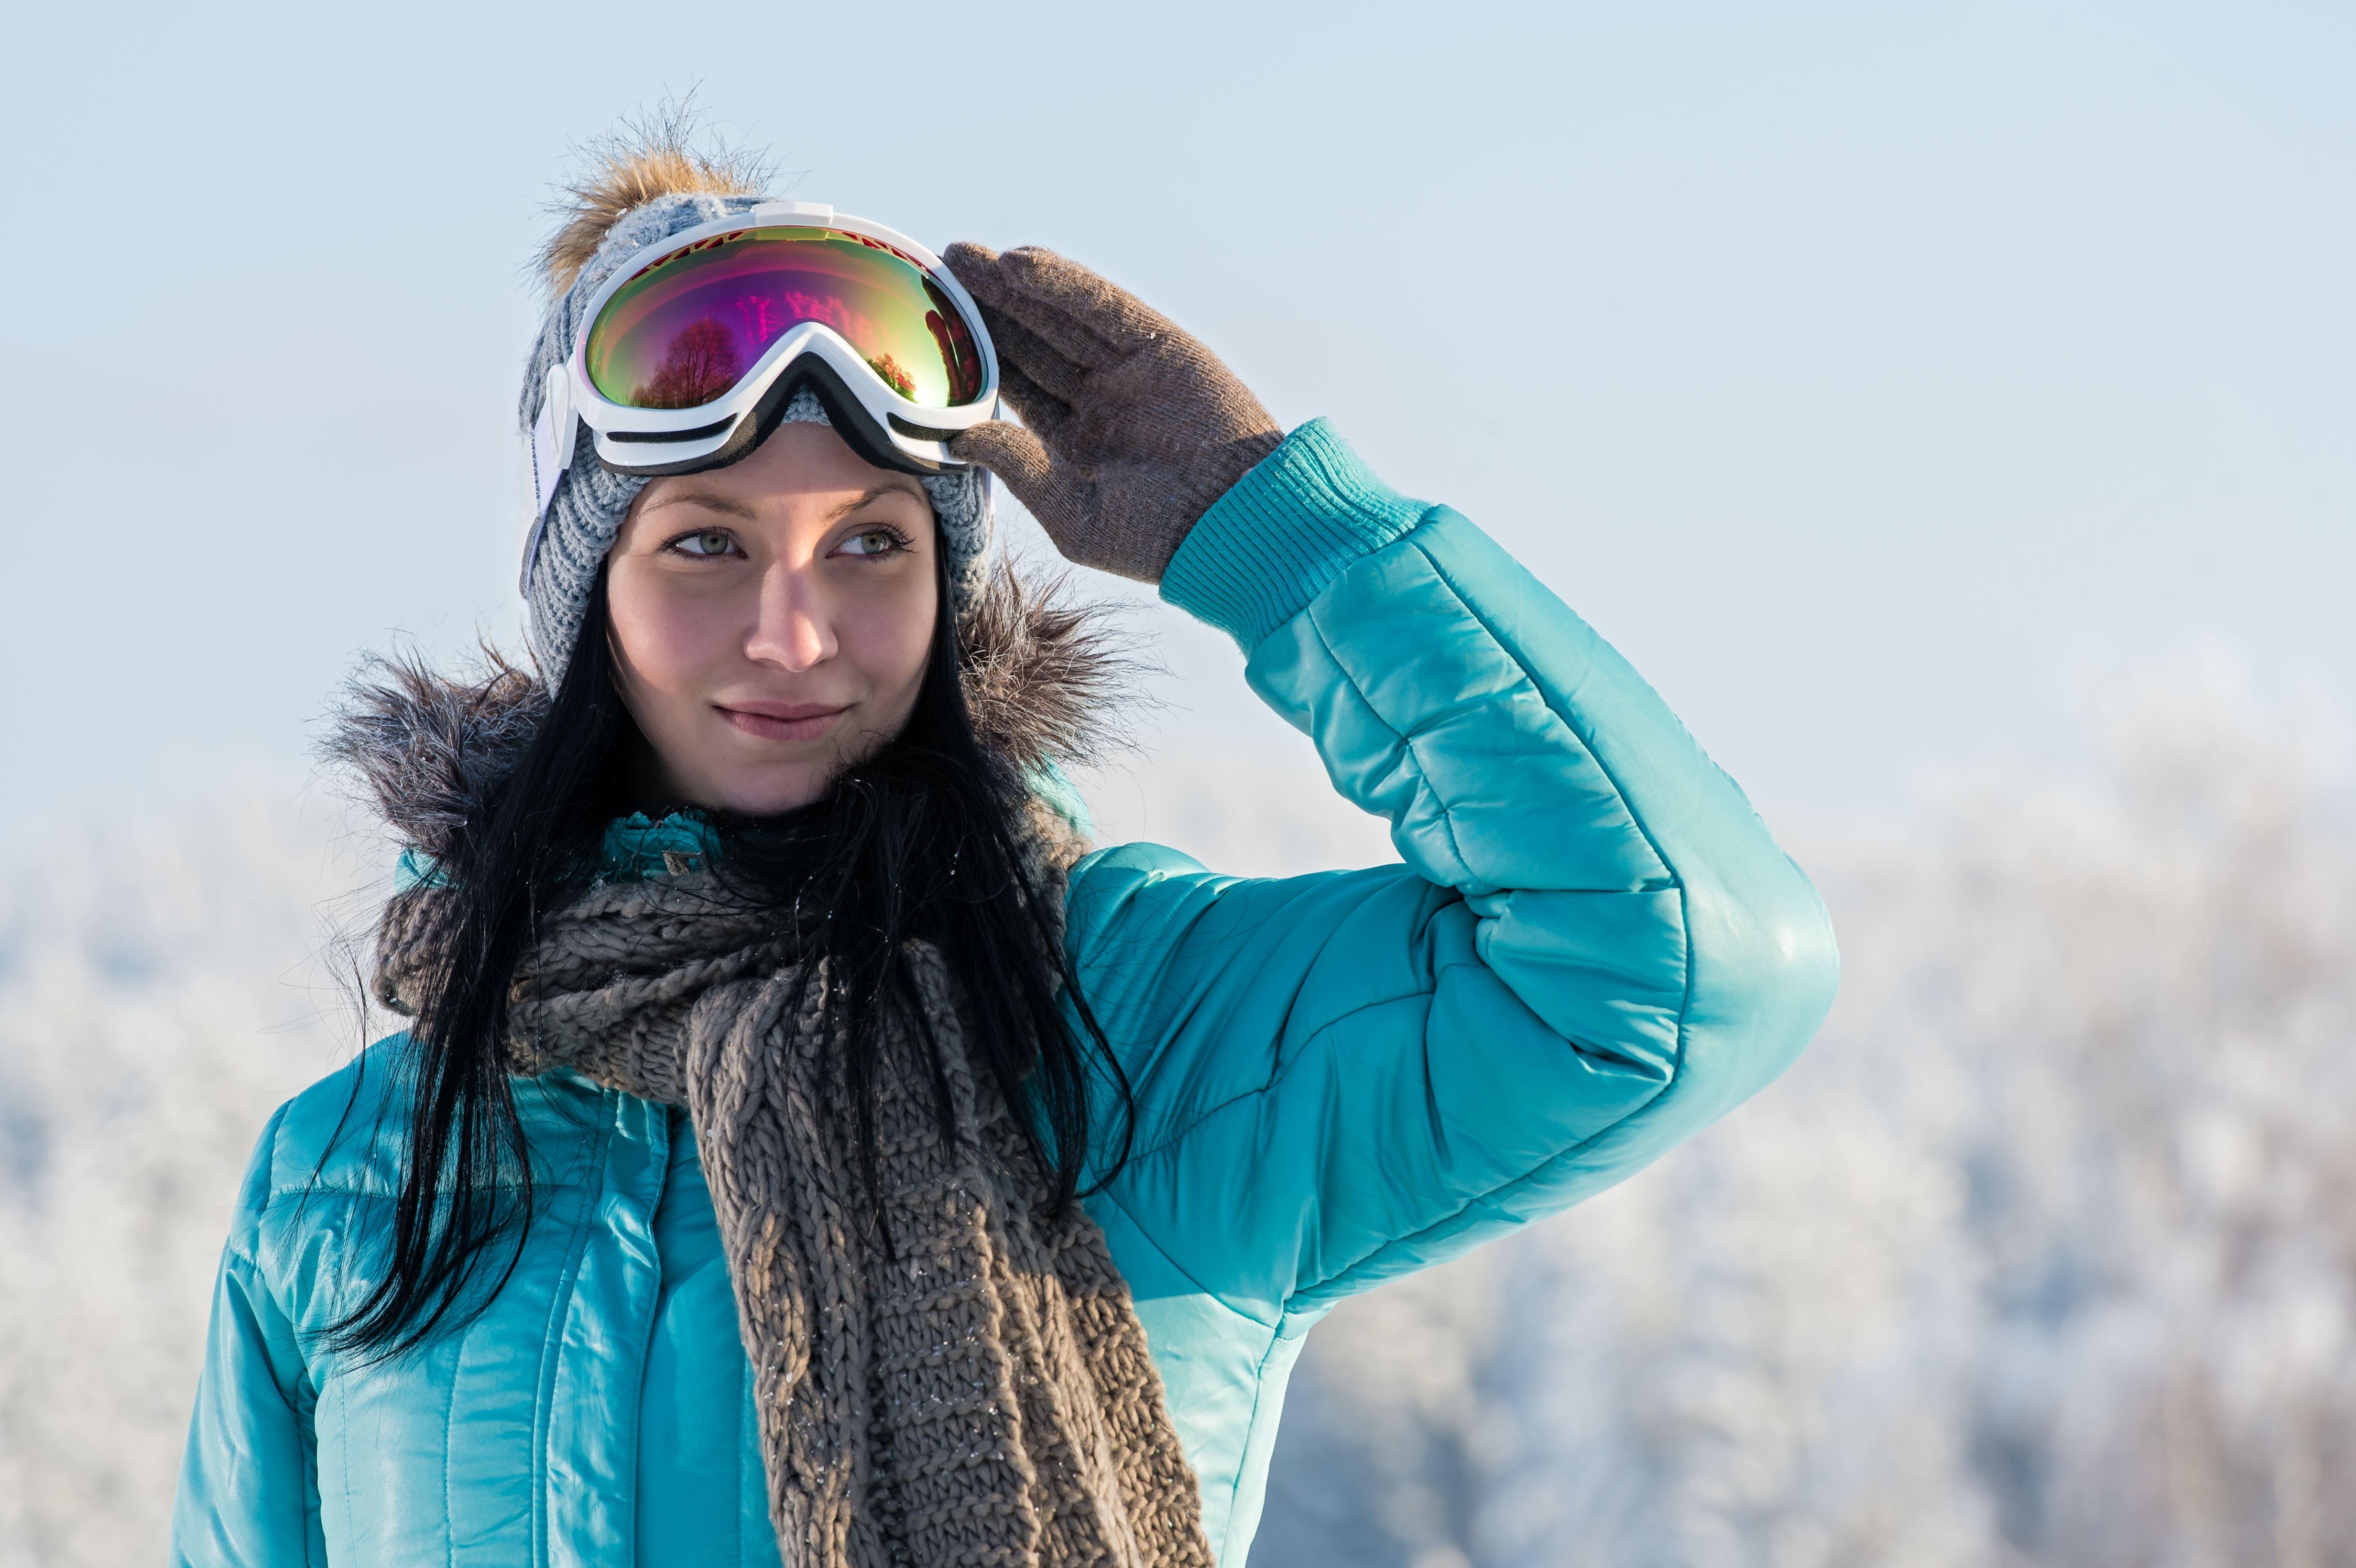 Middagsberget Wintersport